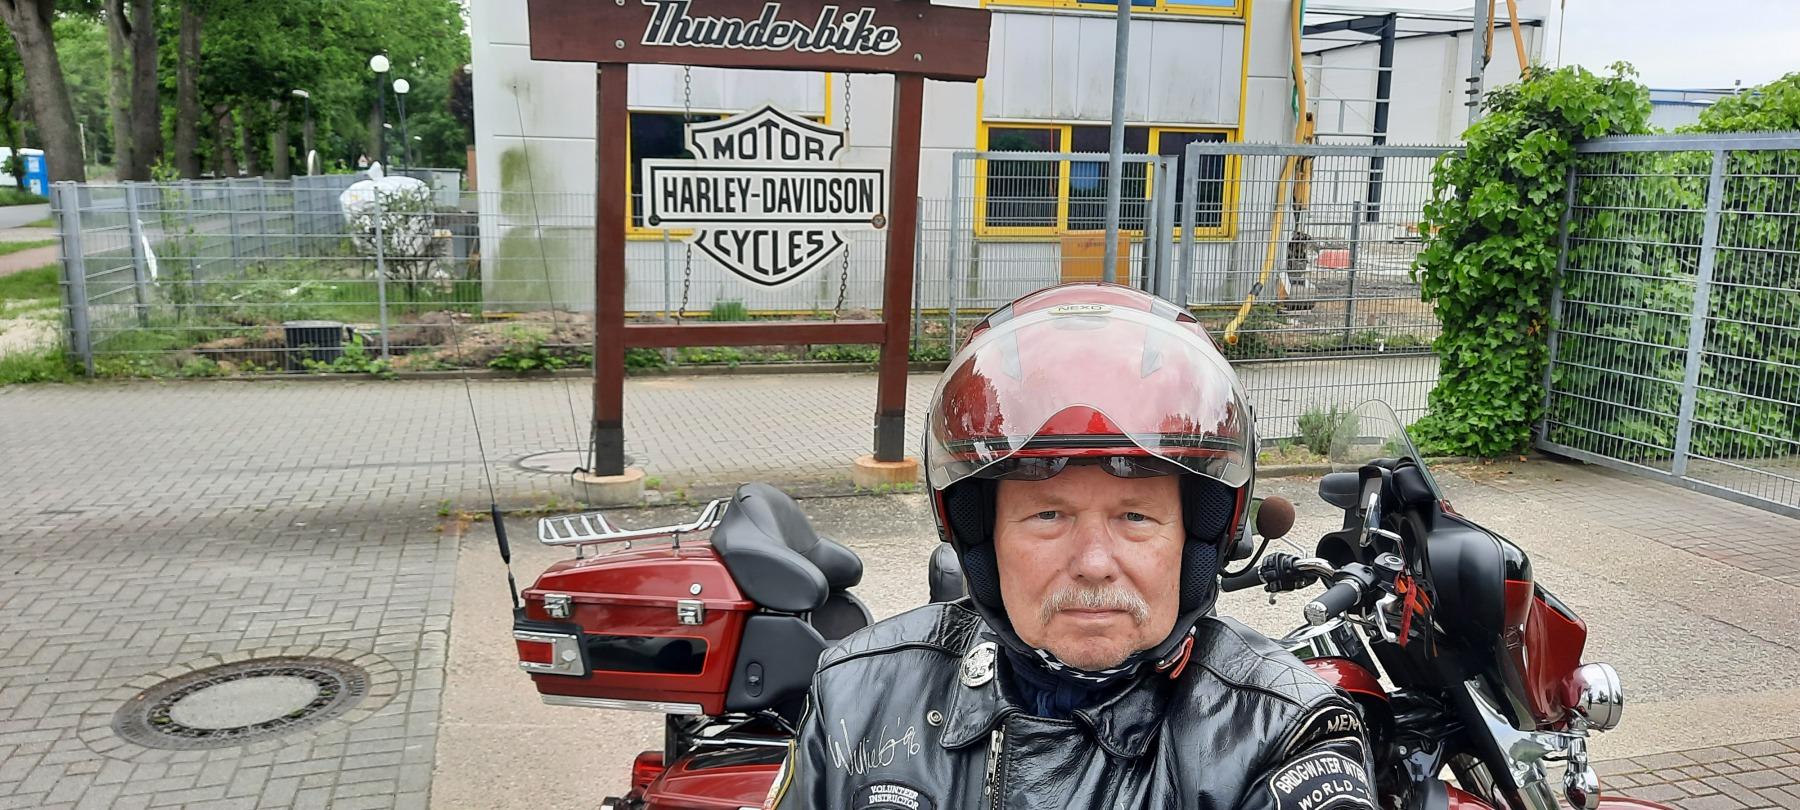 Jochen-Thunderbike